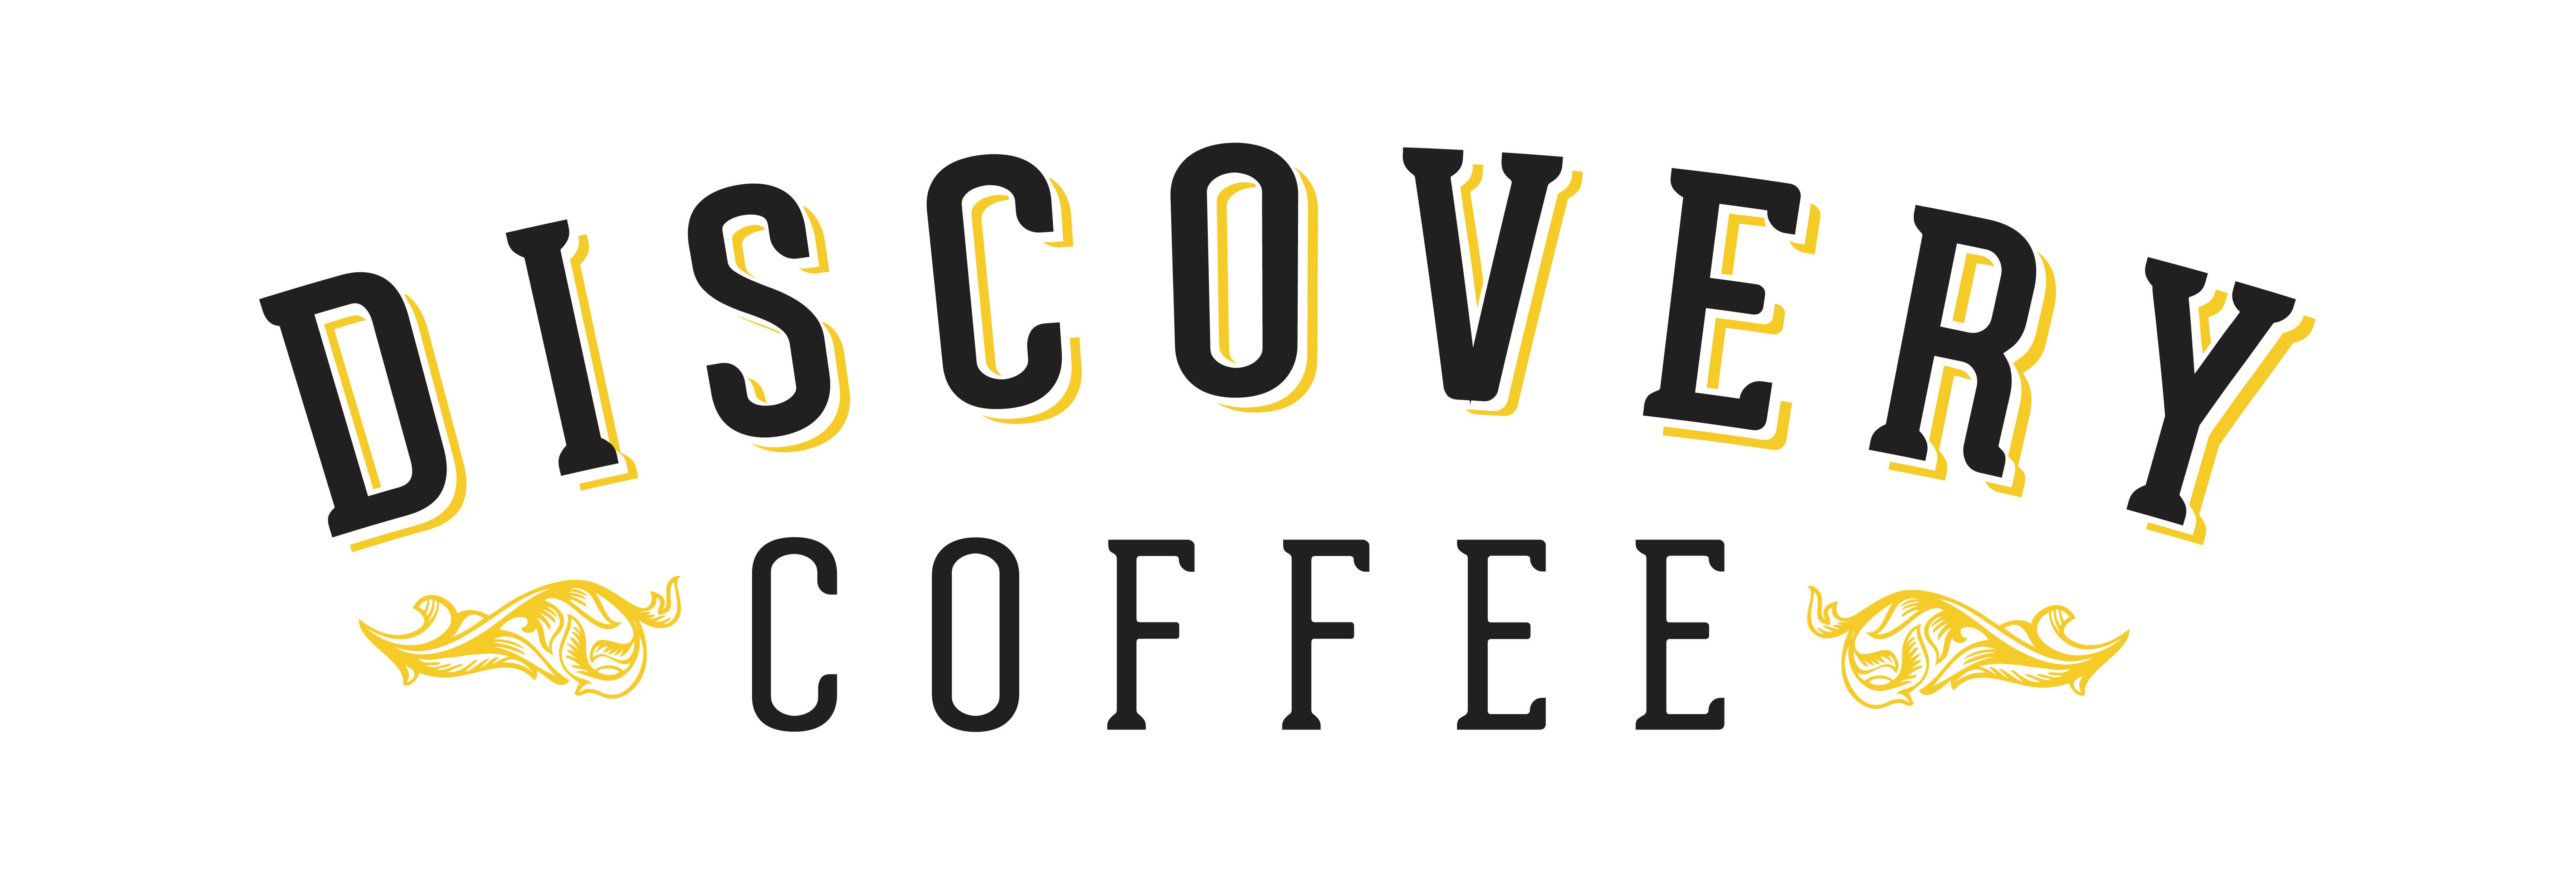 Discovery_coffee_BannerLogo